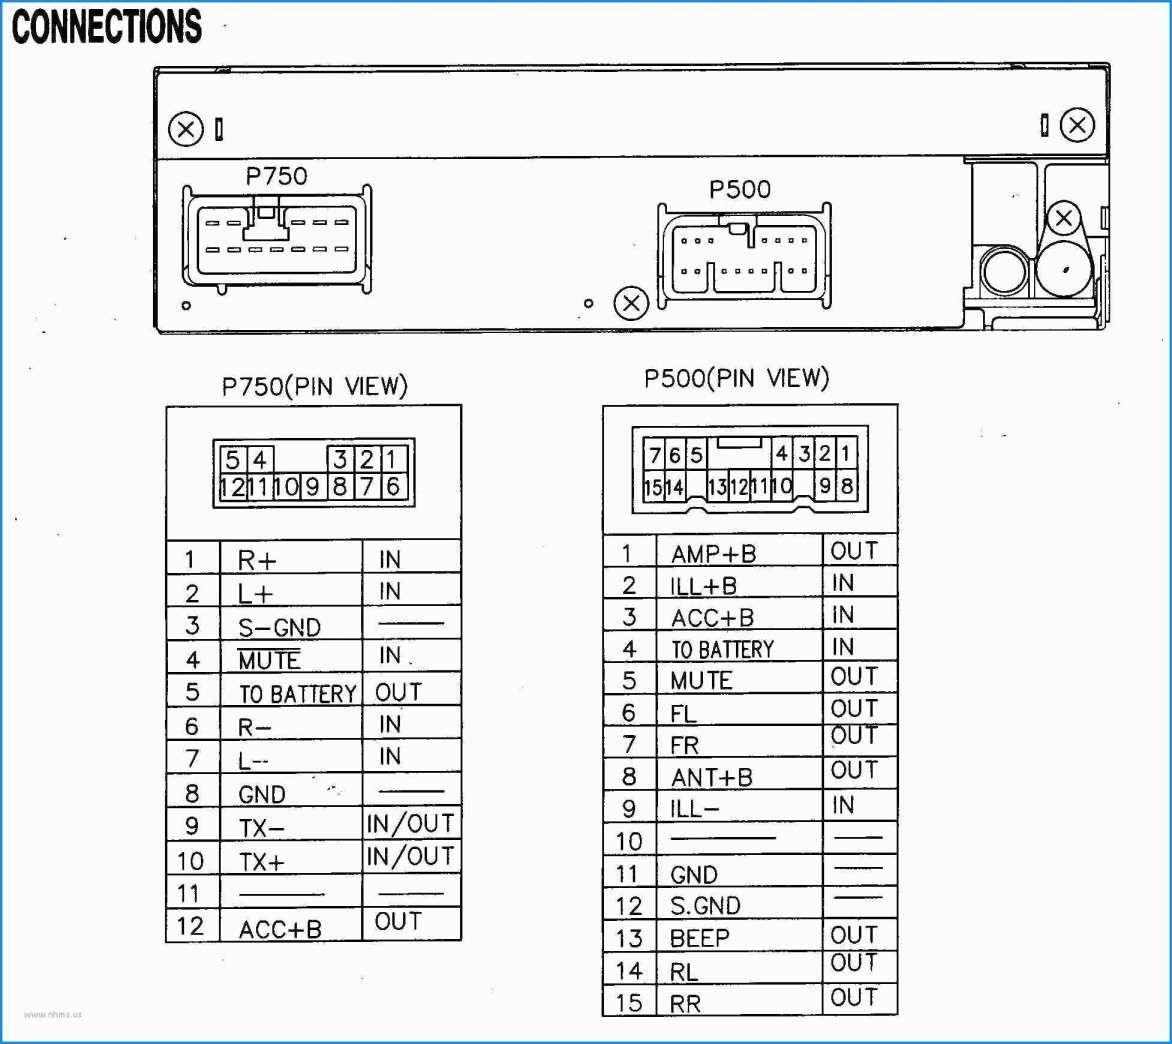 10 Panasonic Car Dvd Player Wiring Diagram Car Diagram Wiringg Net Car Amplifier Car Stereo Electrical Wiring Diagram